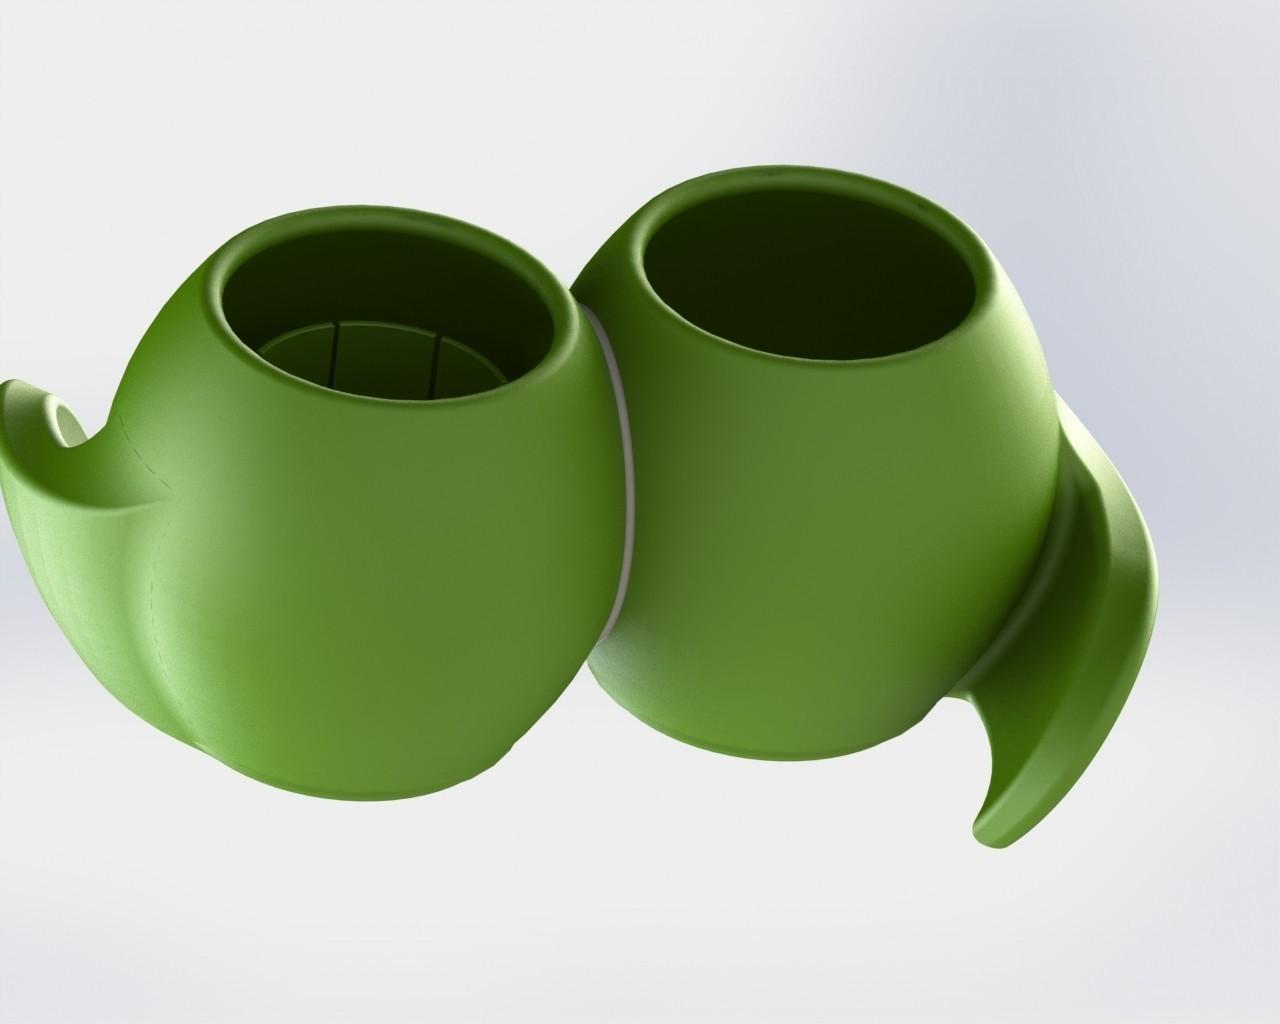 Untitled.JPG Download free STL file Plant pot with reservoir • 3D printable model, Xertos-3d